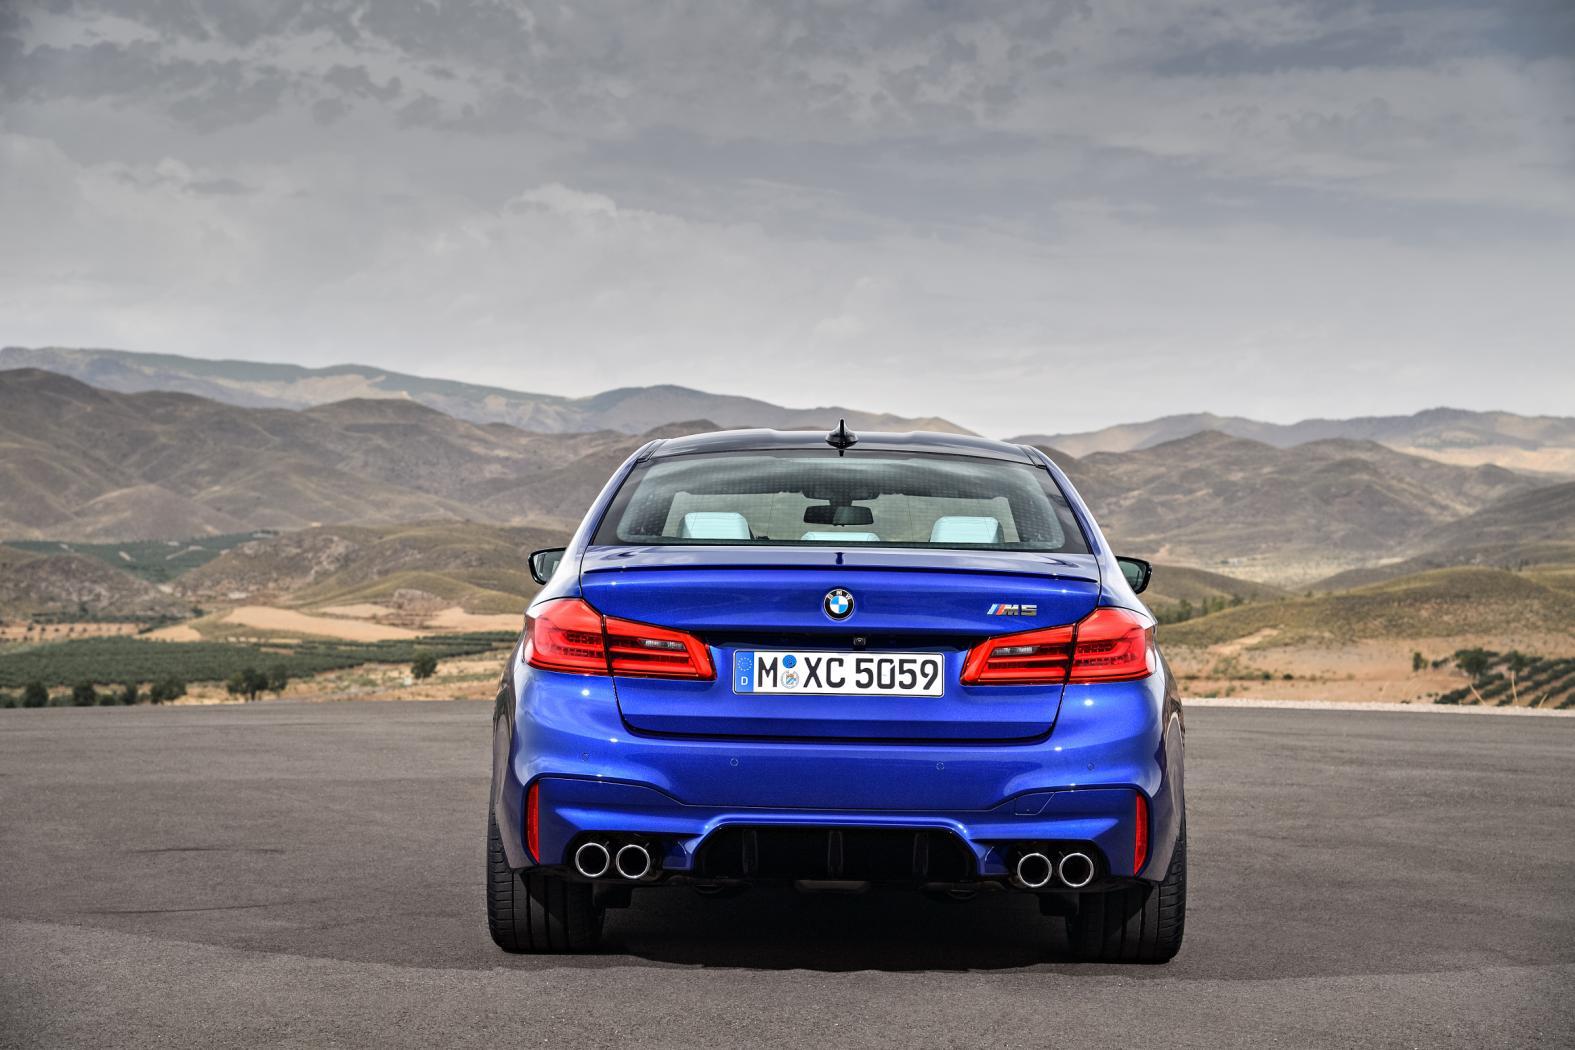 BMW-M5-F90-7.jpeg